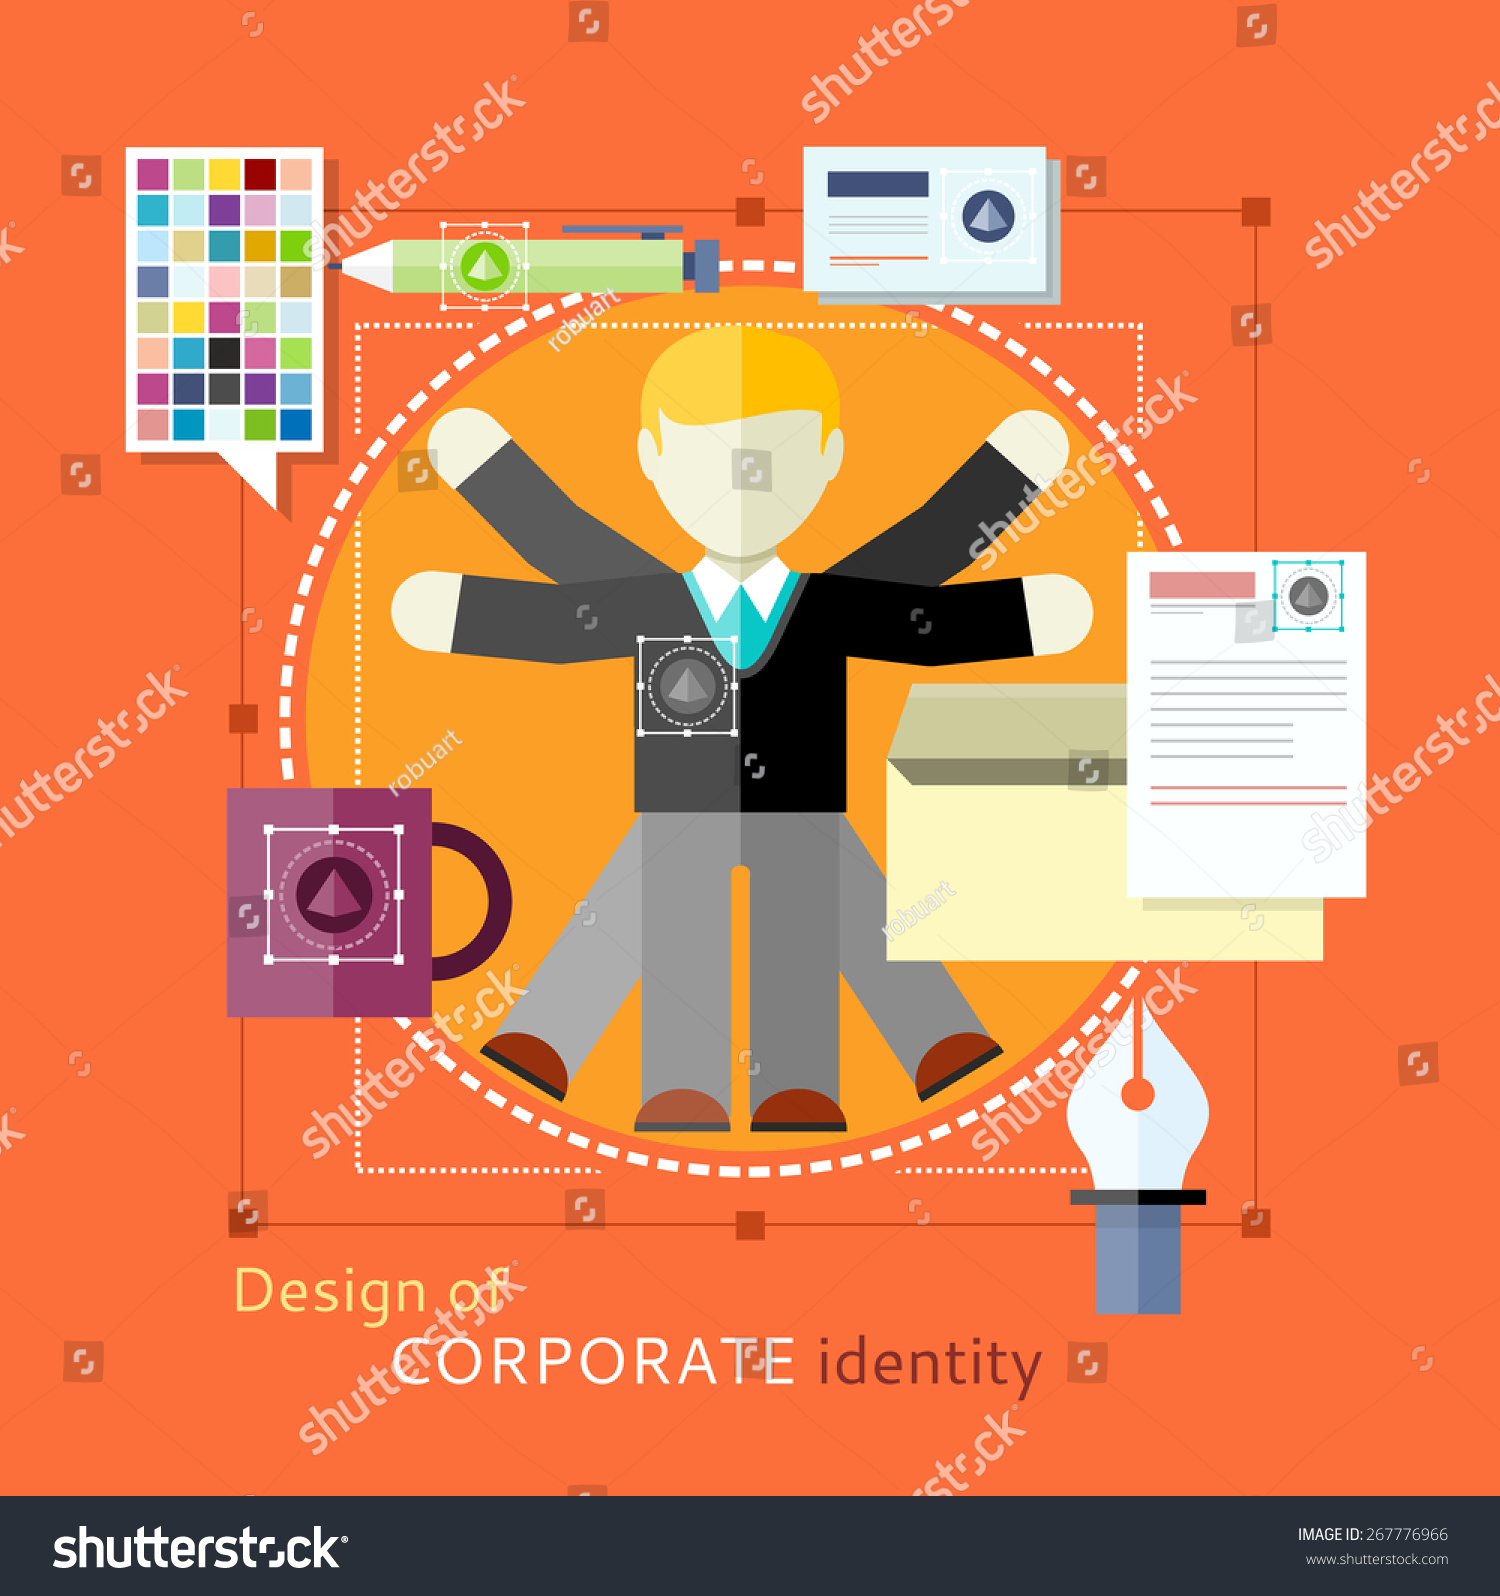 Corporate Identity Concept Design Human Resources Stock Vector